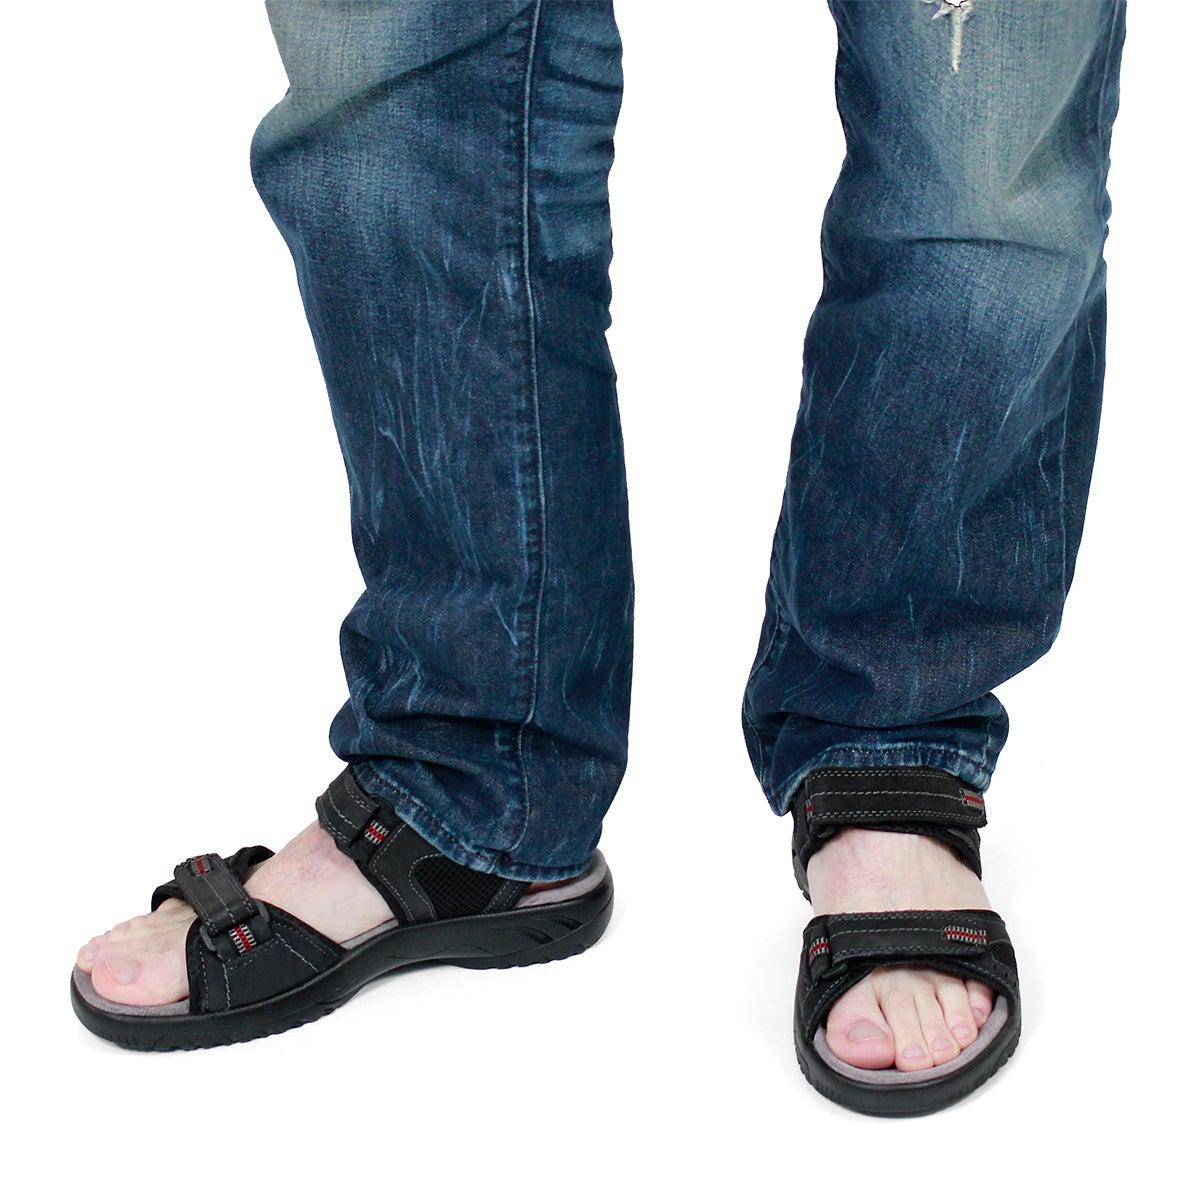 Mns Kurt black 3 strap sport sandal